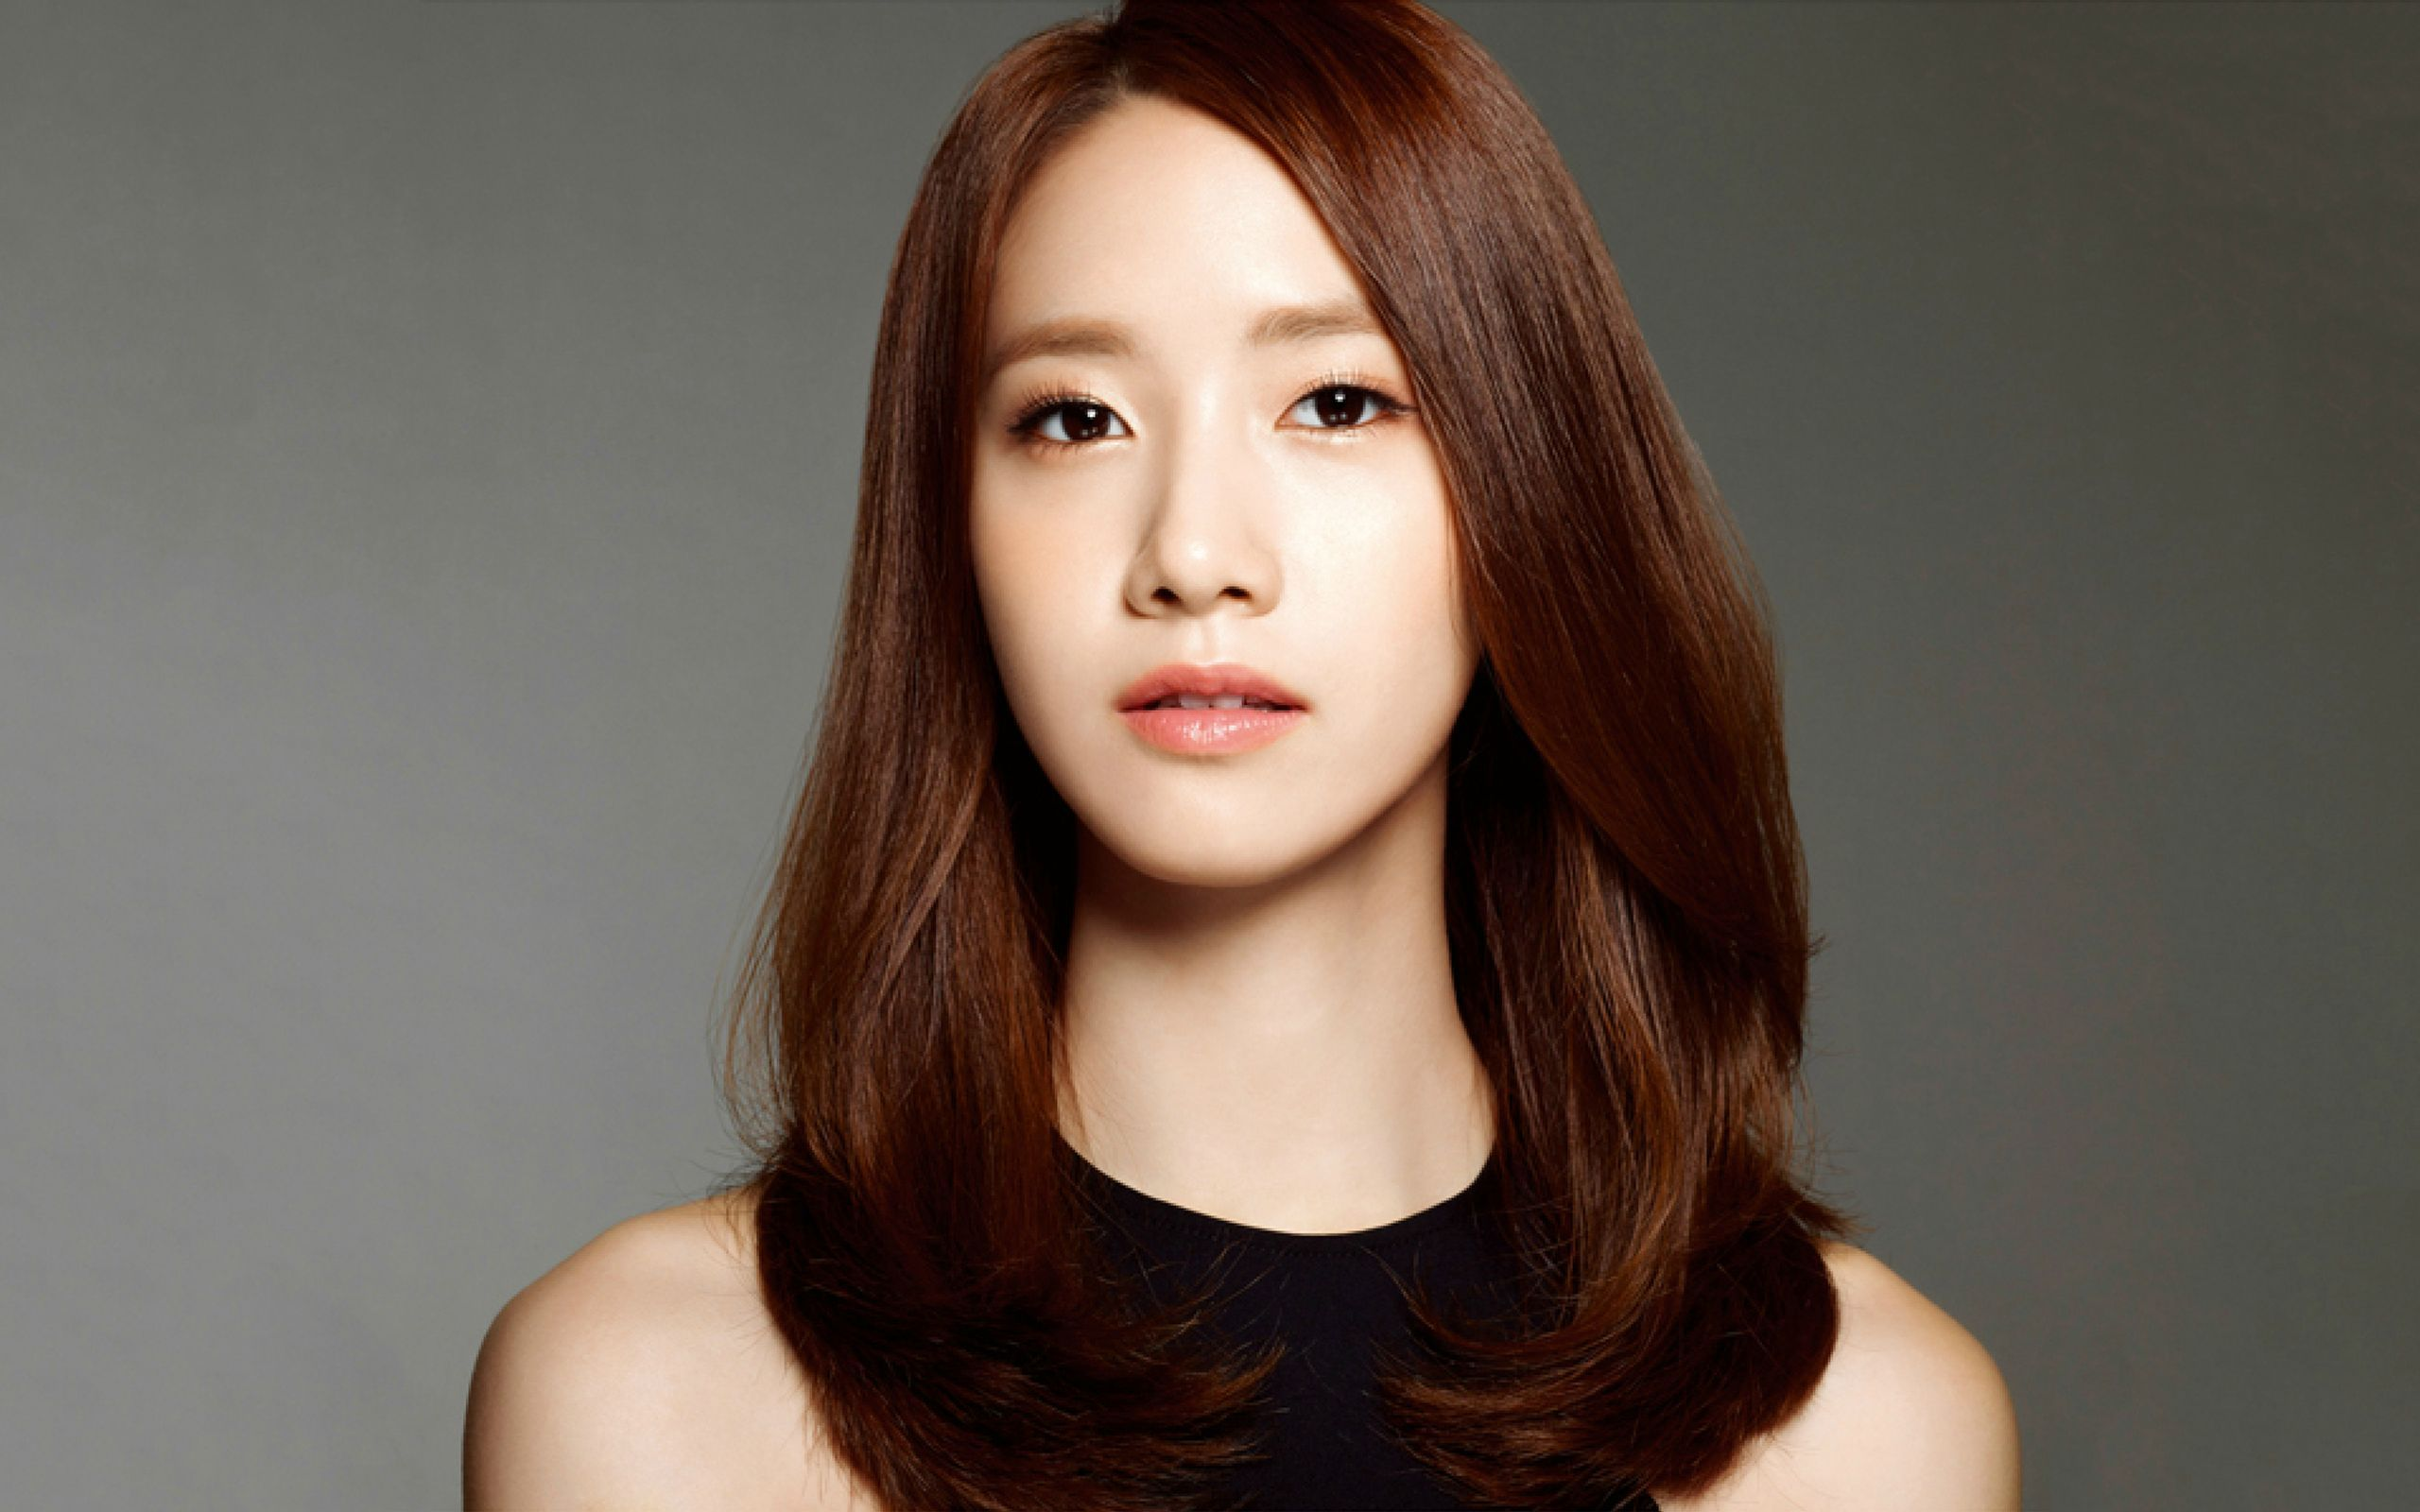 Chloe hairubeauty the best korean hair salon in sydney